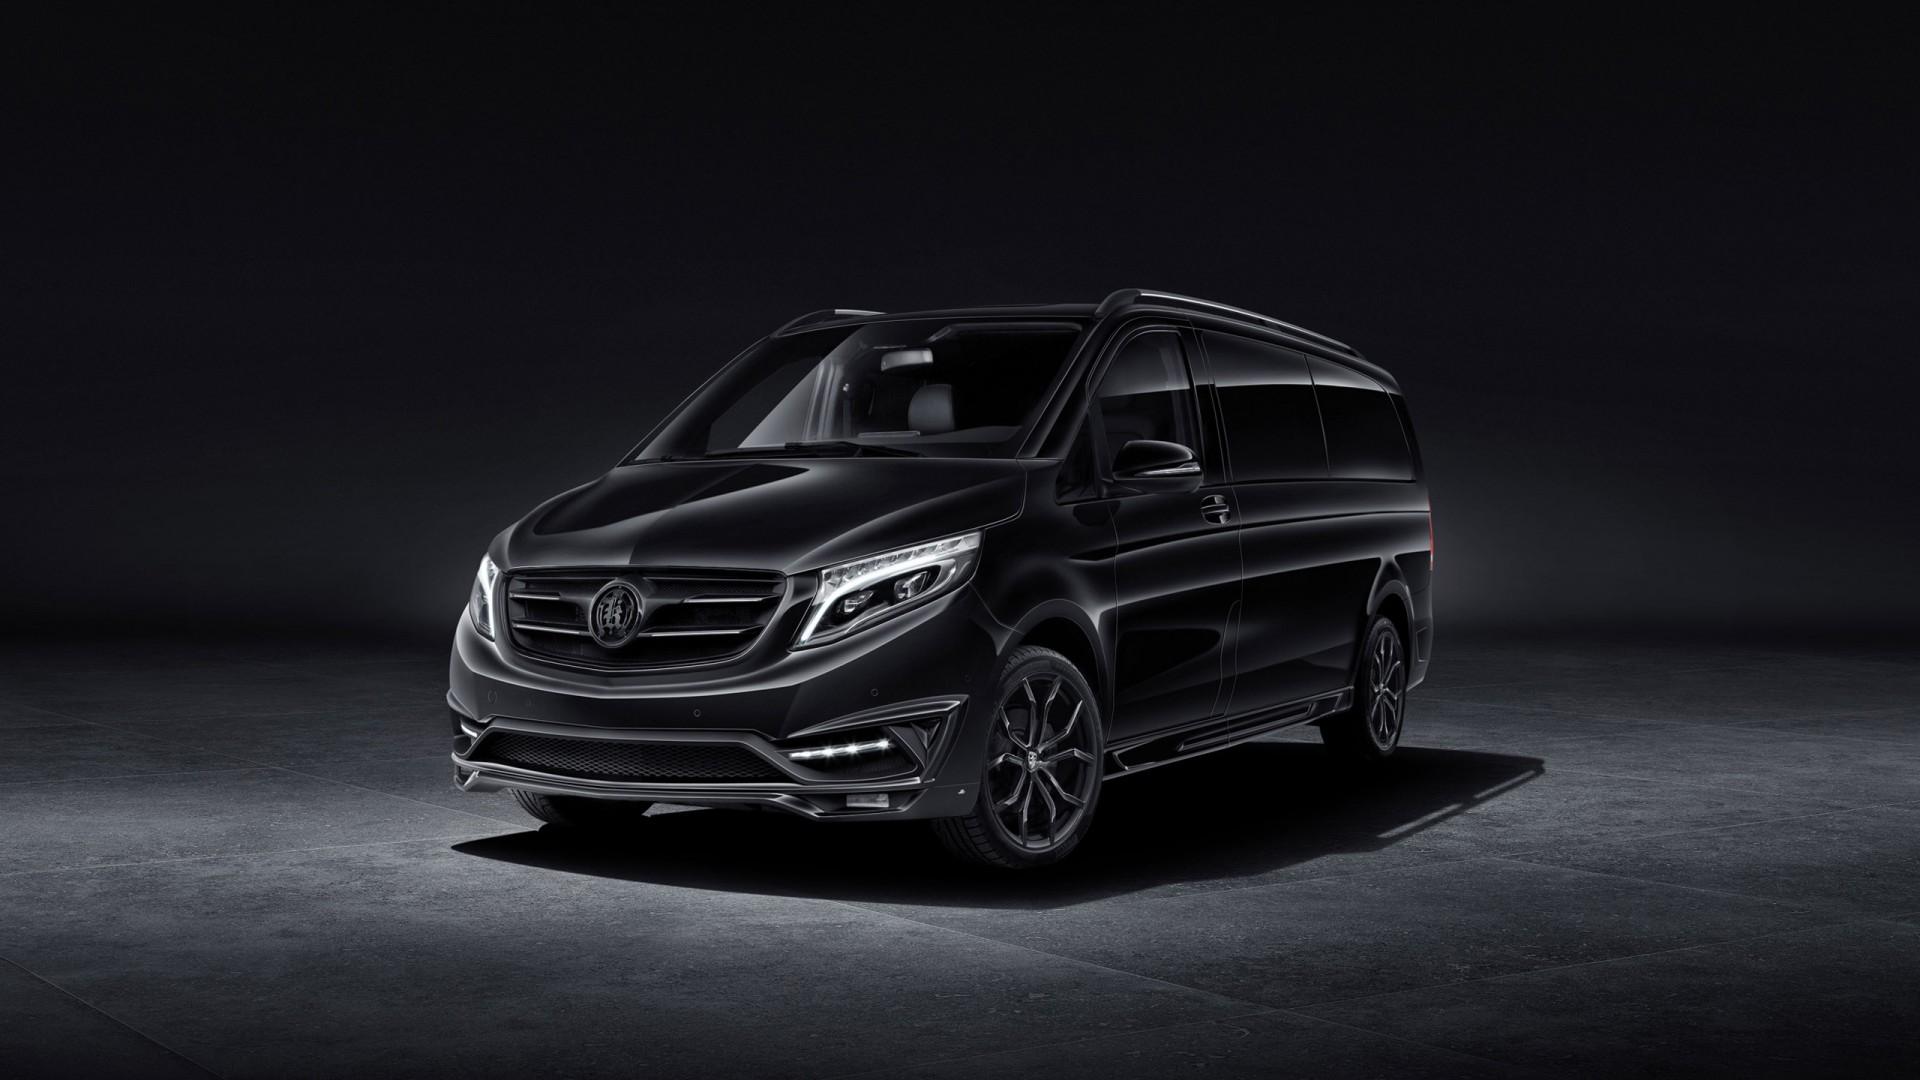 2016 Larte Design Mercedes Benz V Class Black Crystal ...